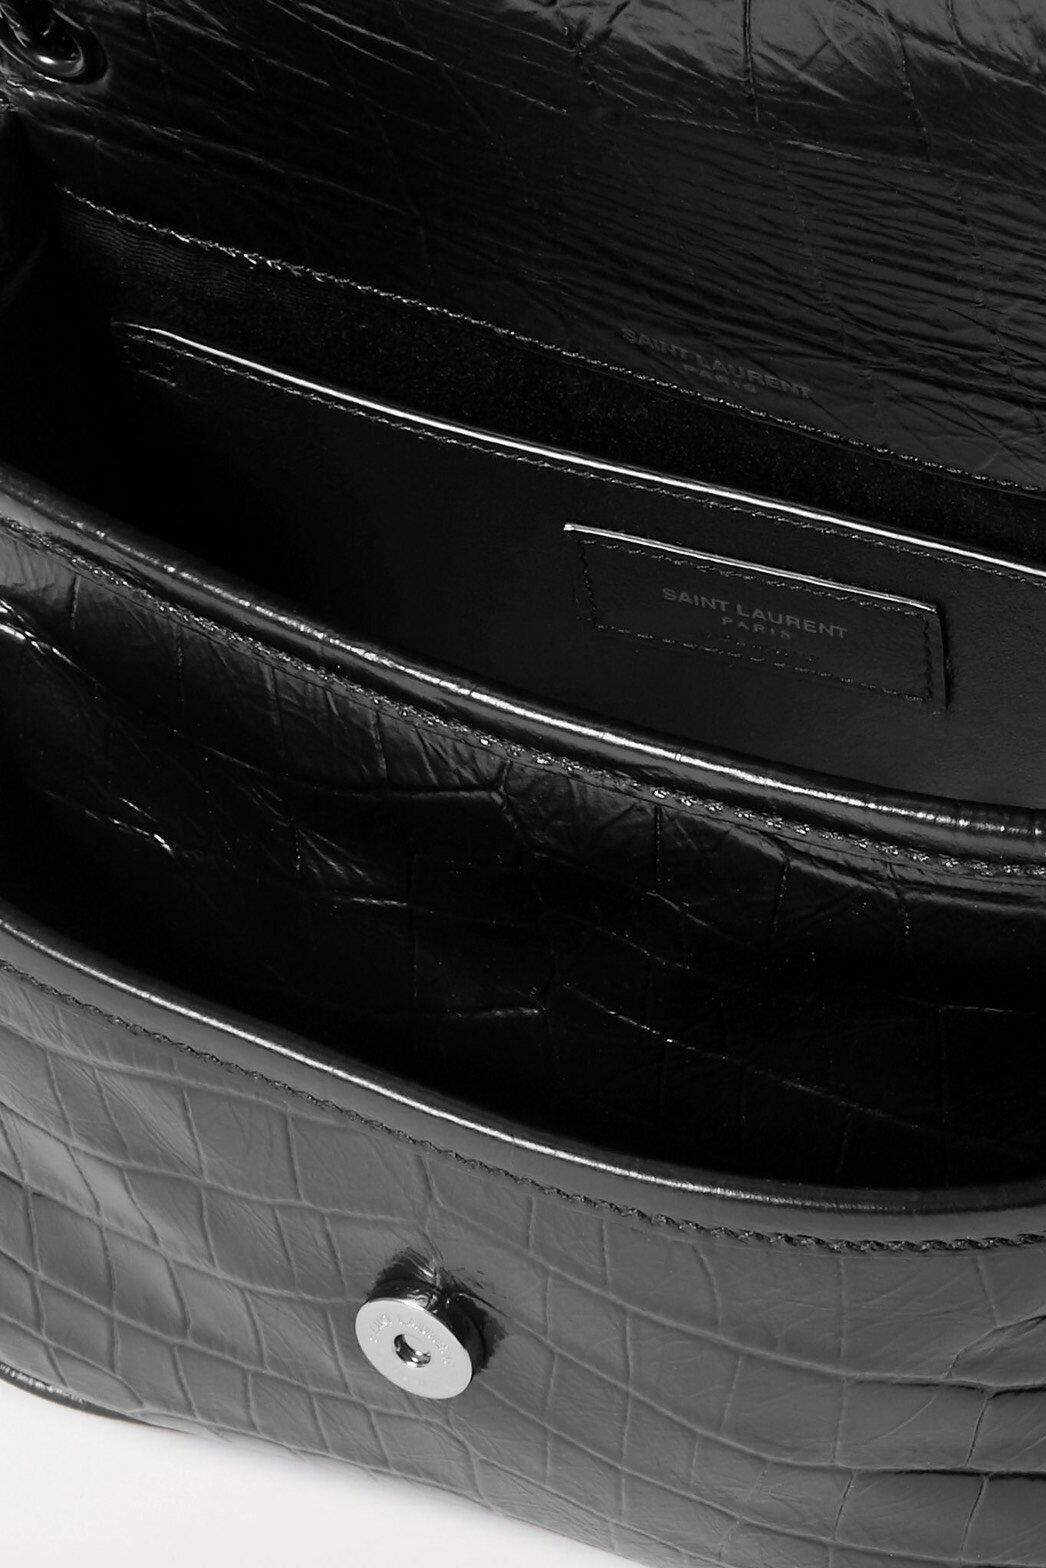 SAINT LAURENT YSL Niki mini鏈條側背包 尺寸17*17*23cm $ 私